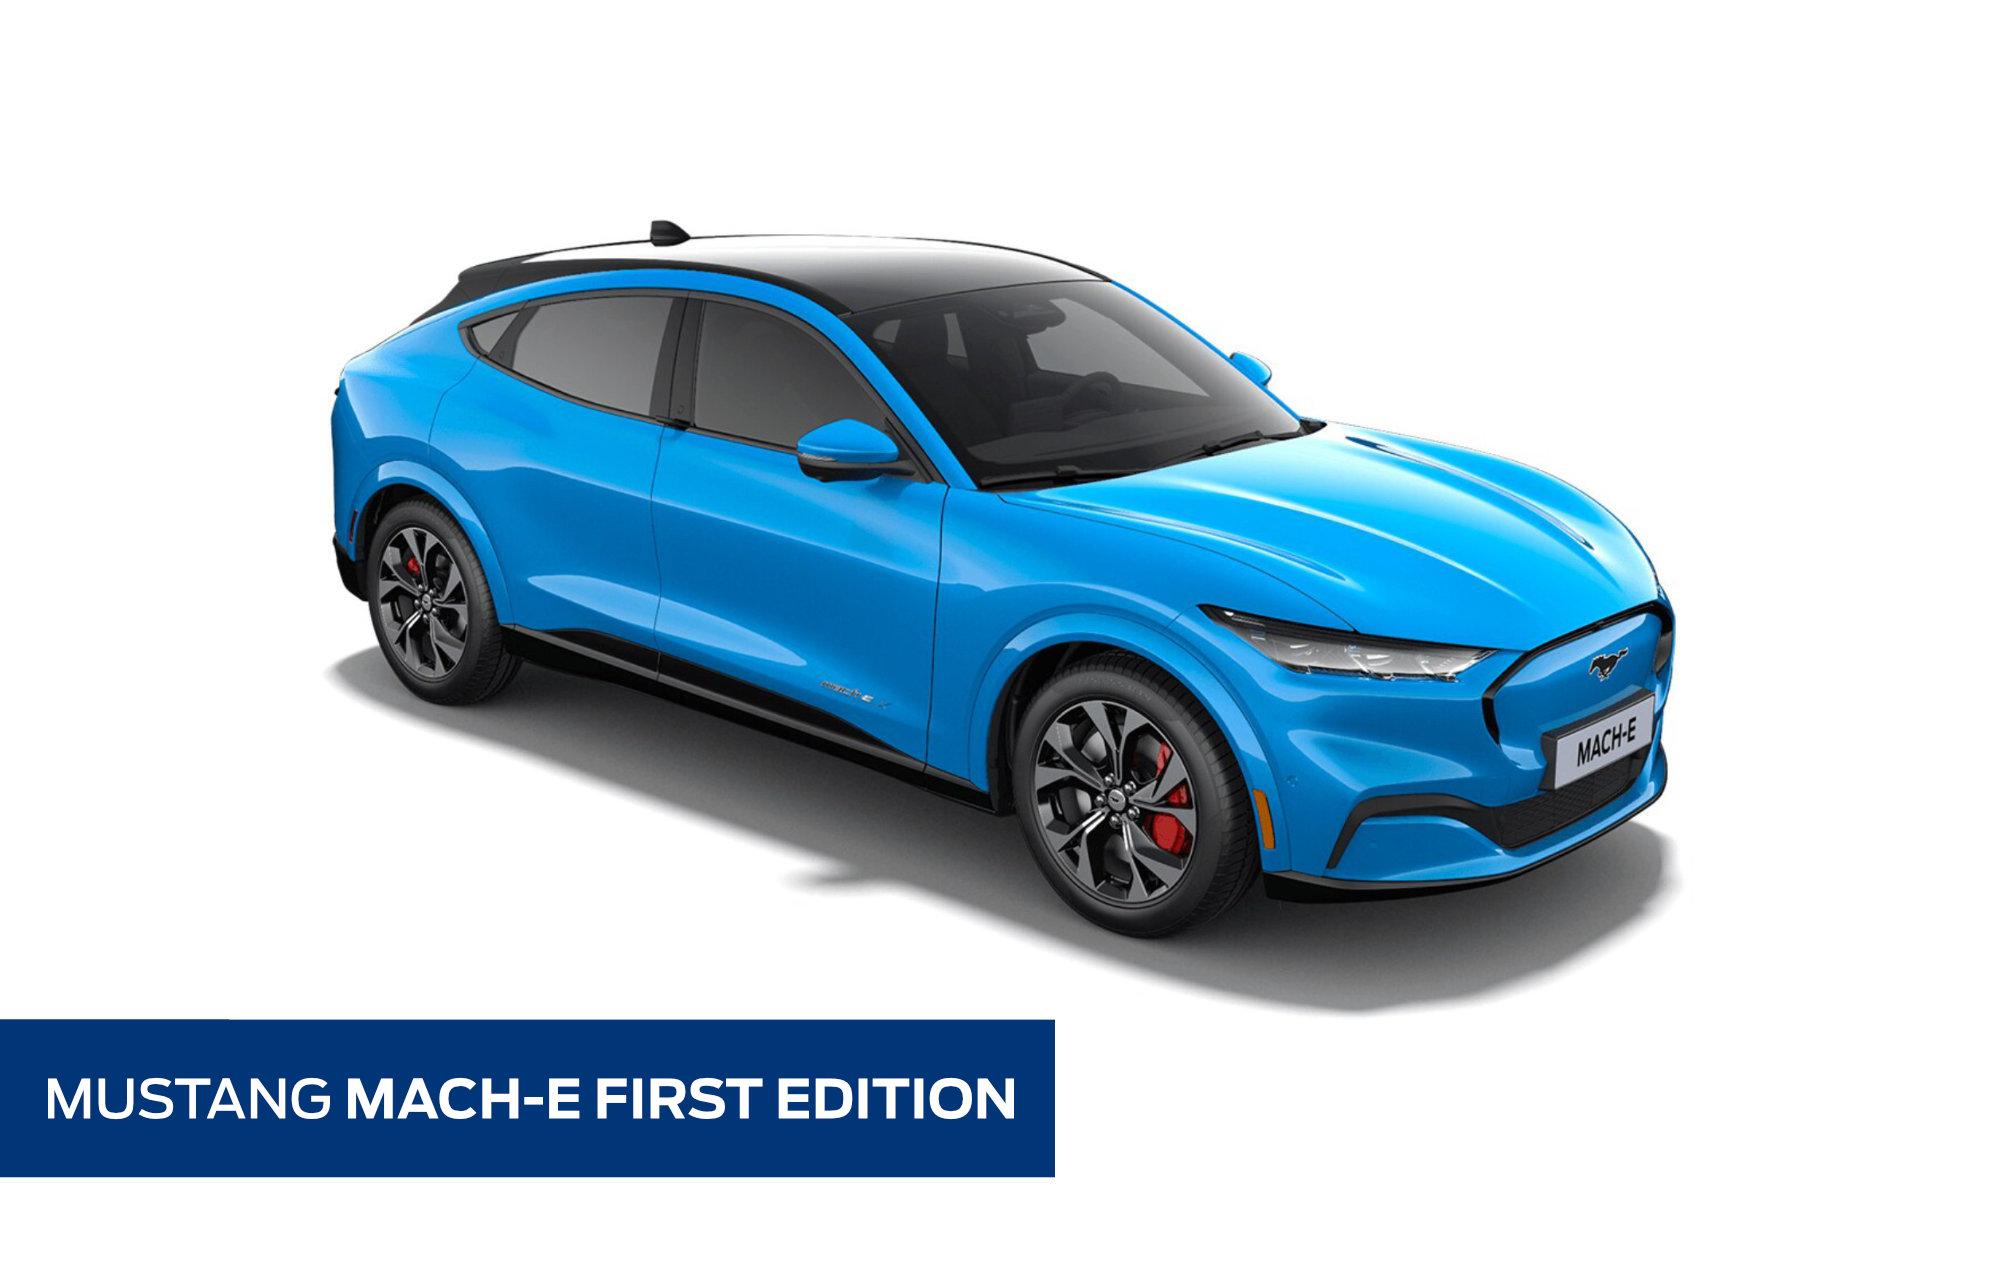 Mustang Mach-E First Edition